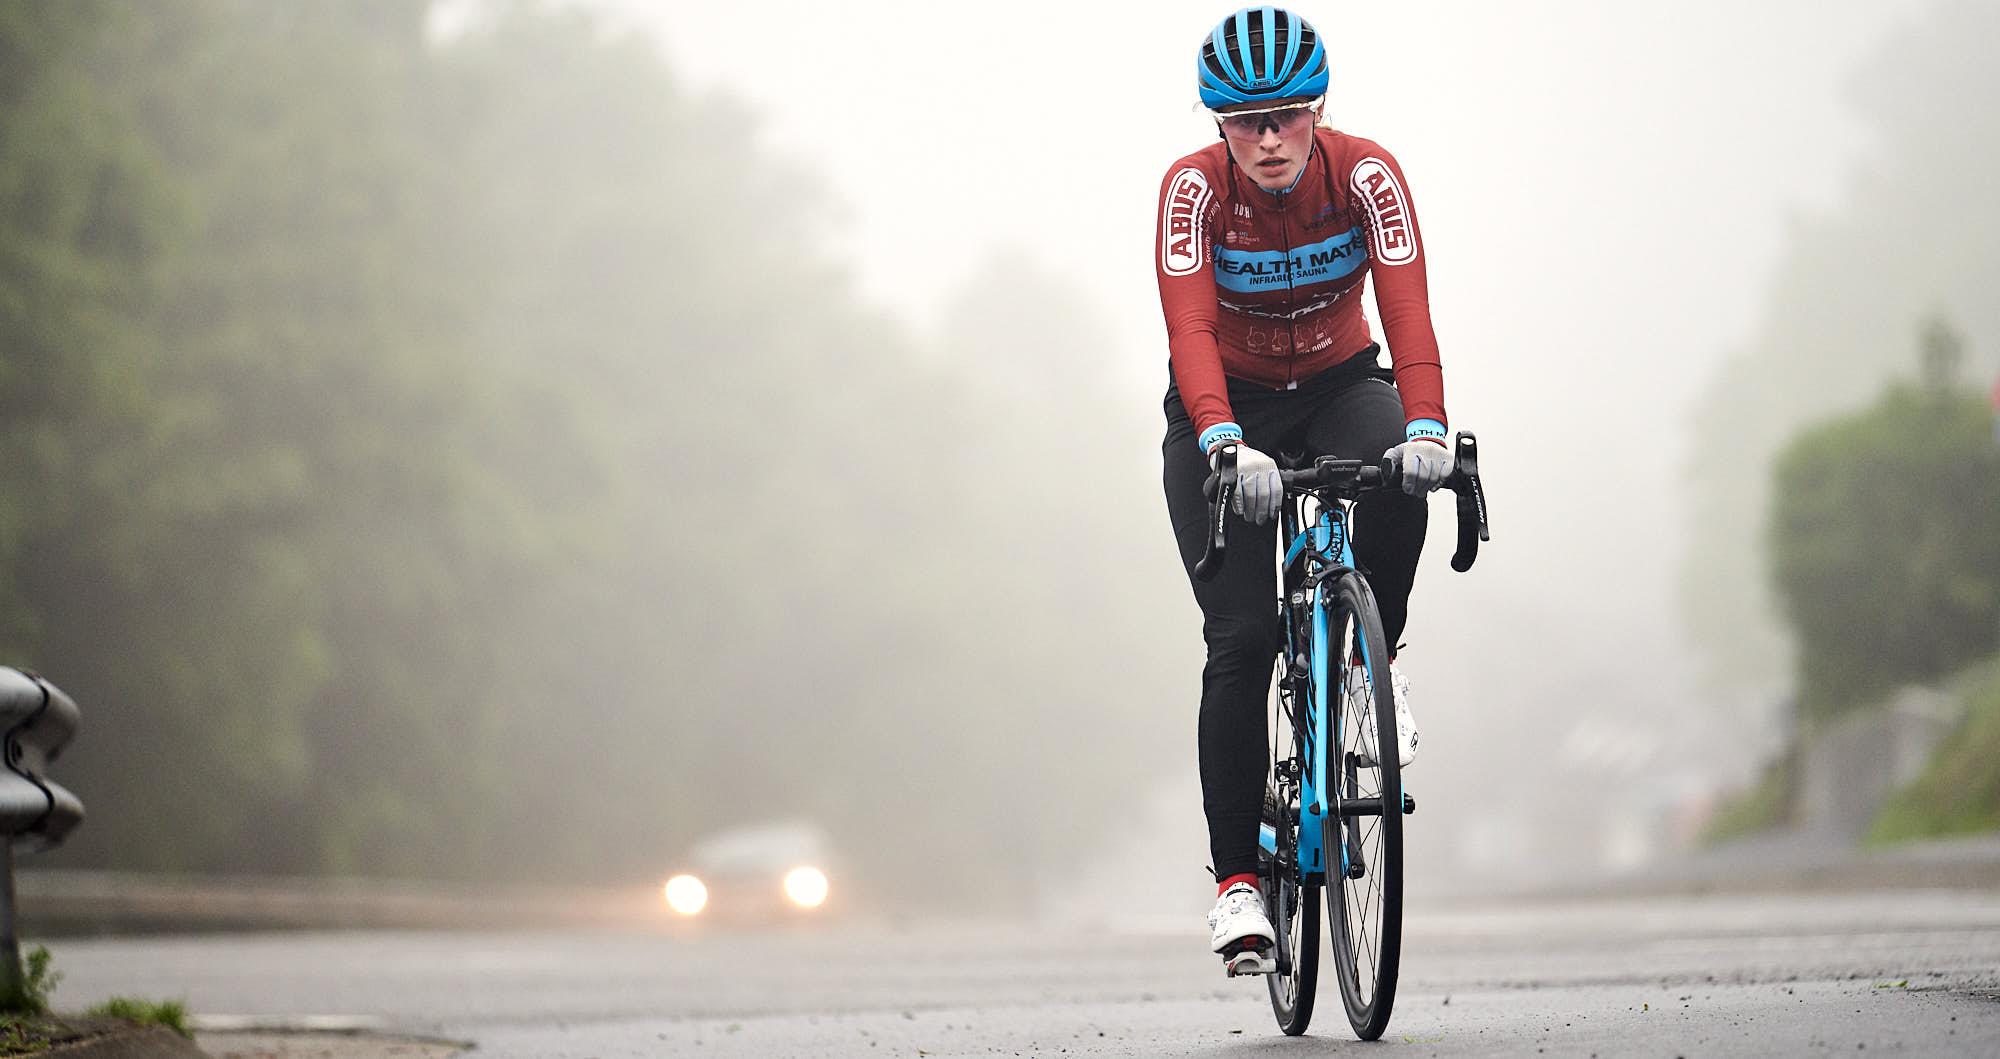 Elodie Kuijper riding her bike during training